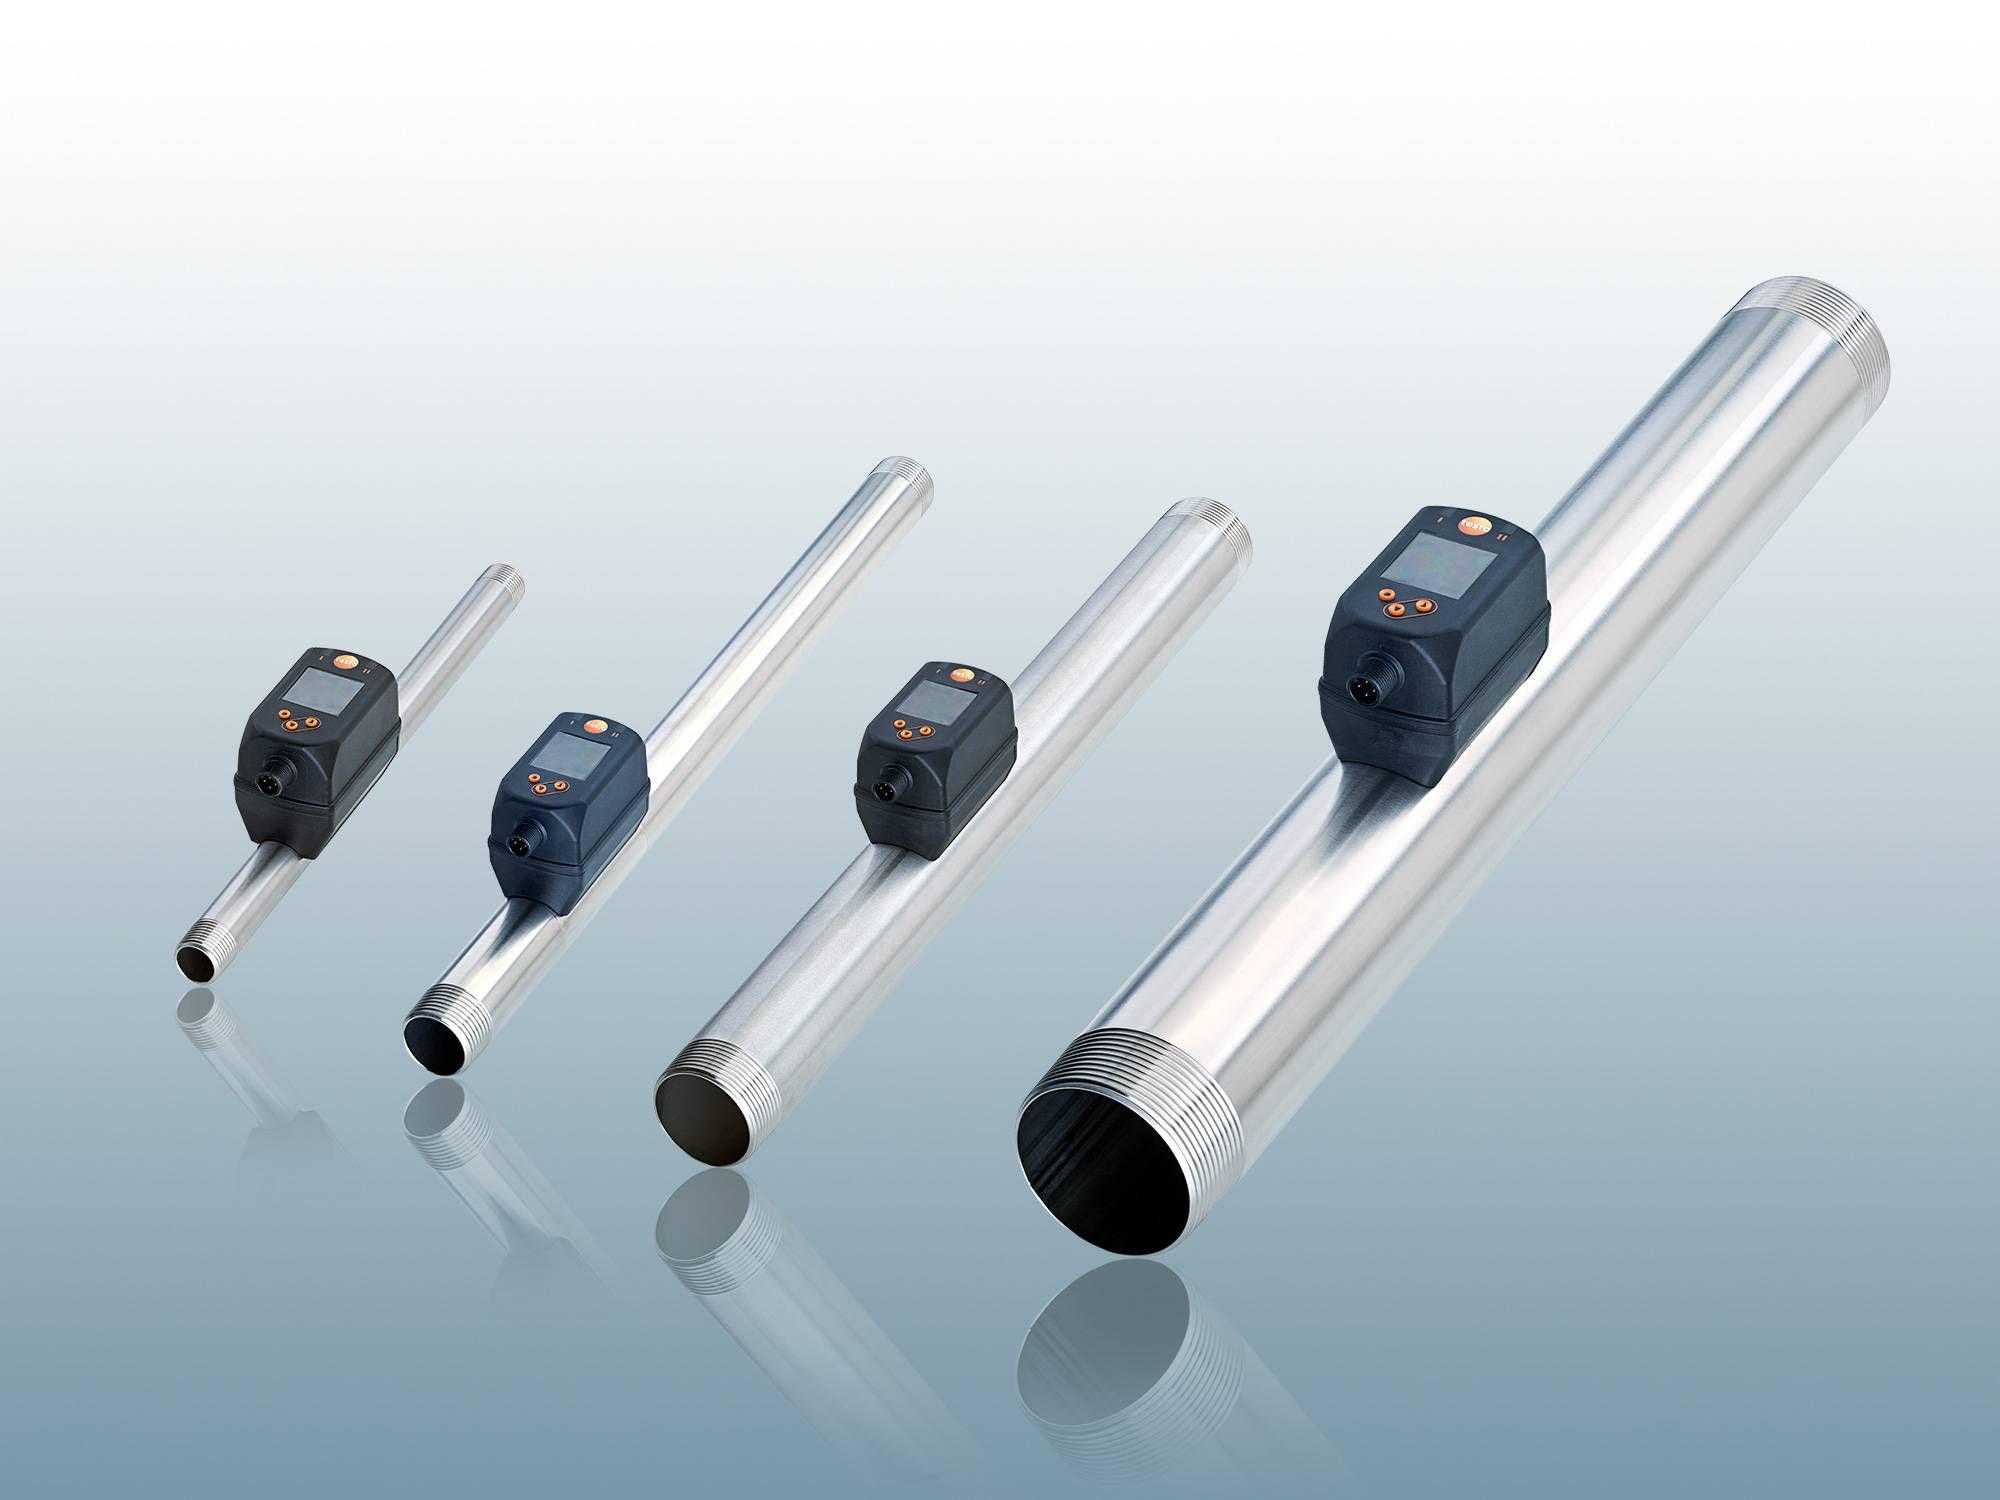 testo 6451 - 6454 用于普通直径和内置压力测量